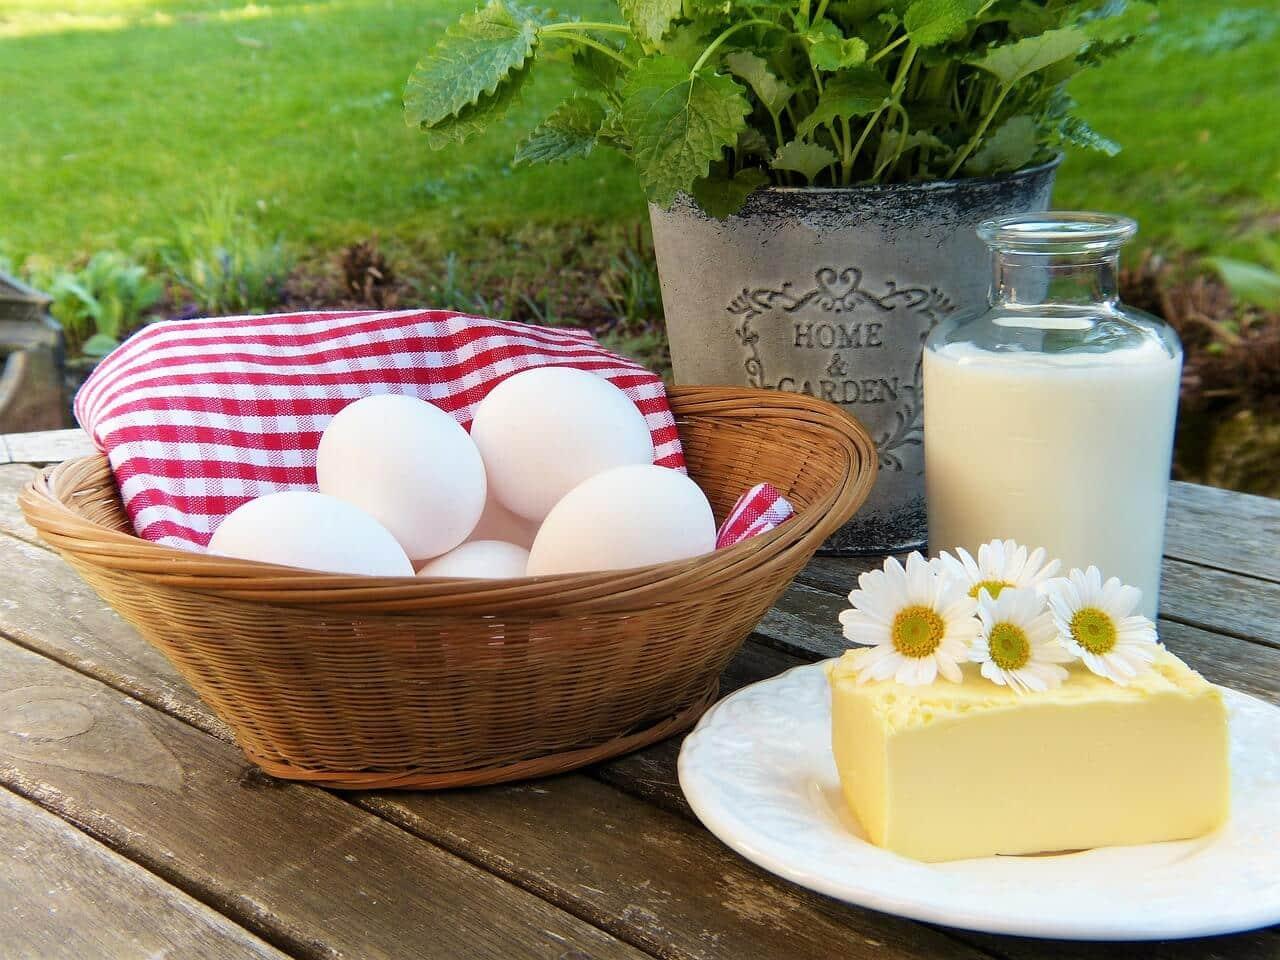 Food with calcium